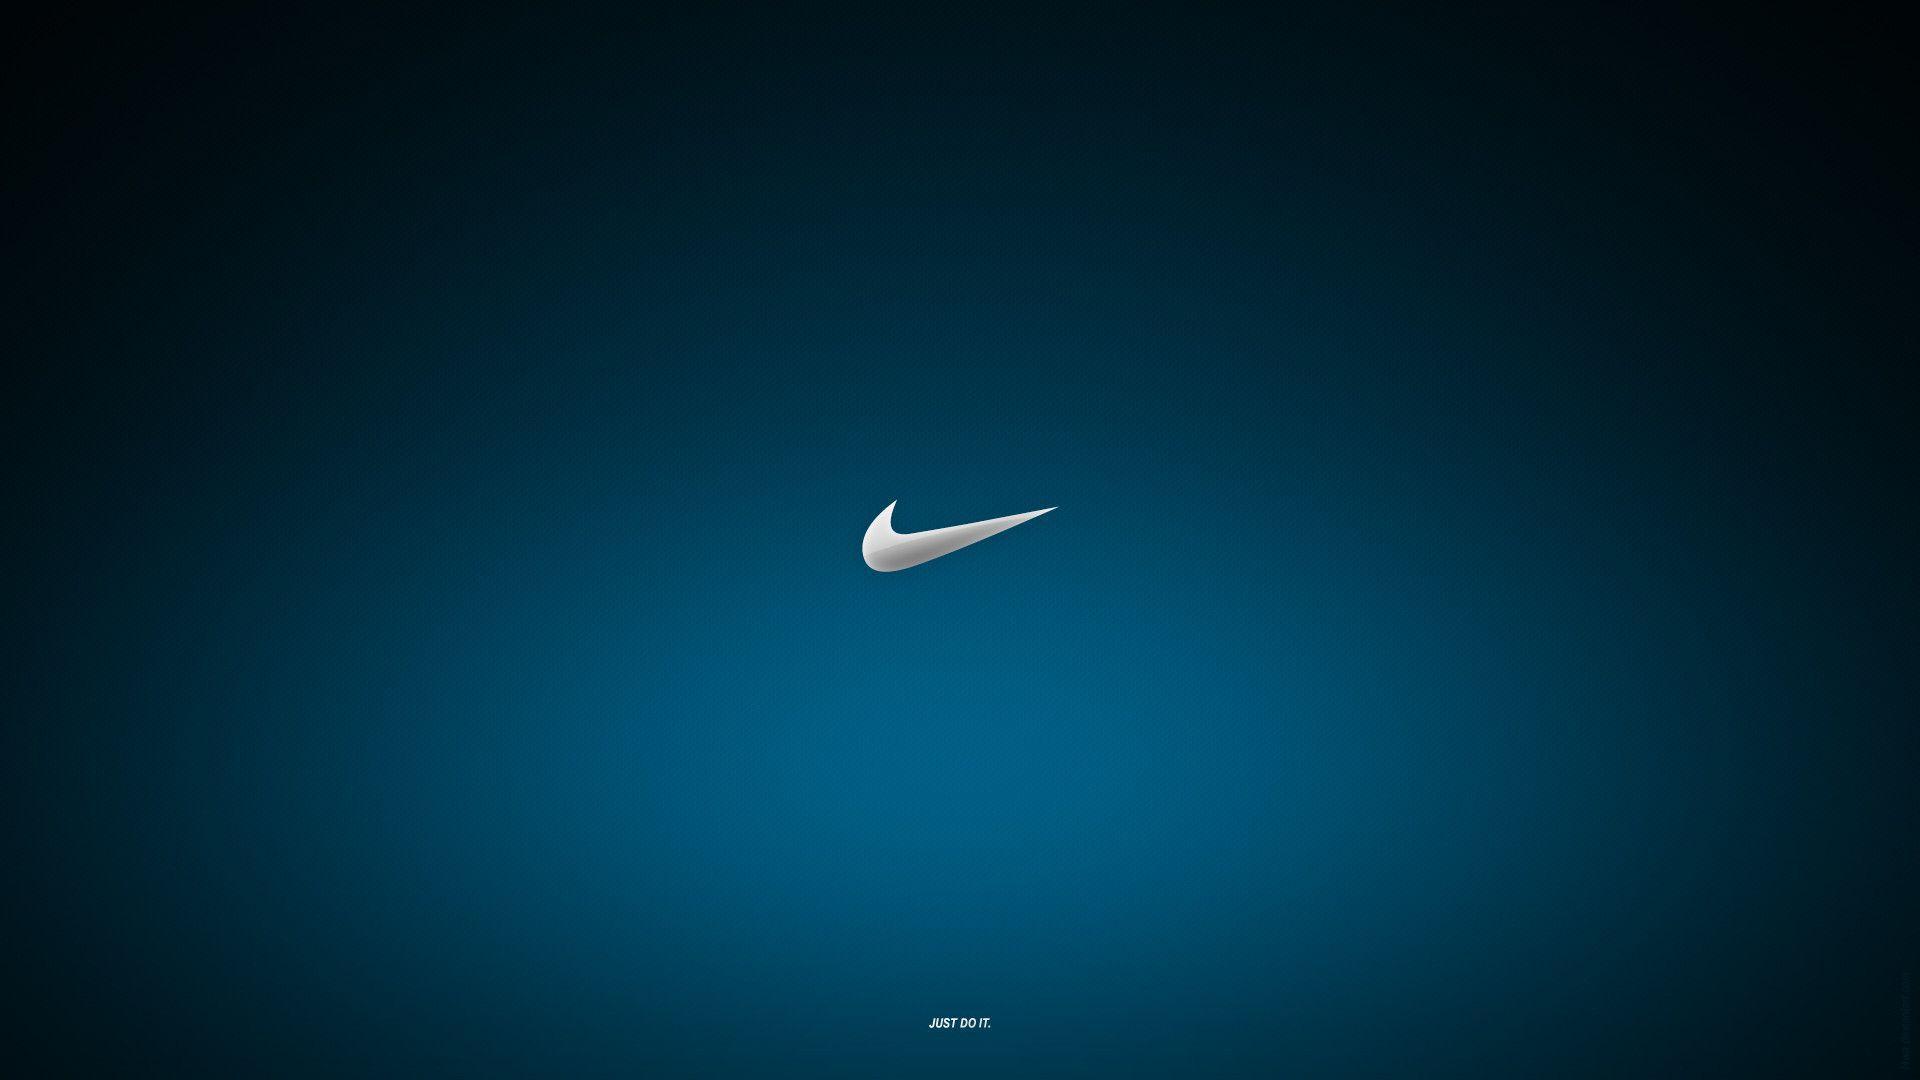 Nike HD Wallpapers 1920x1080